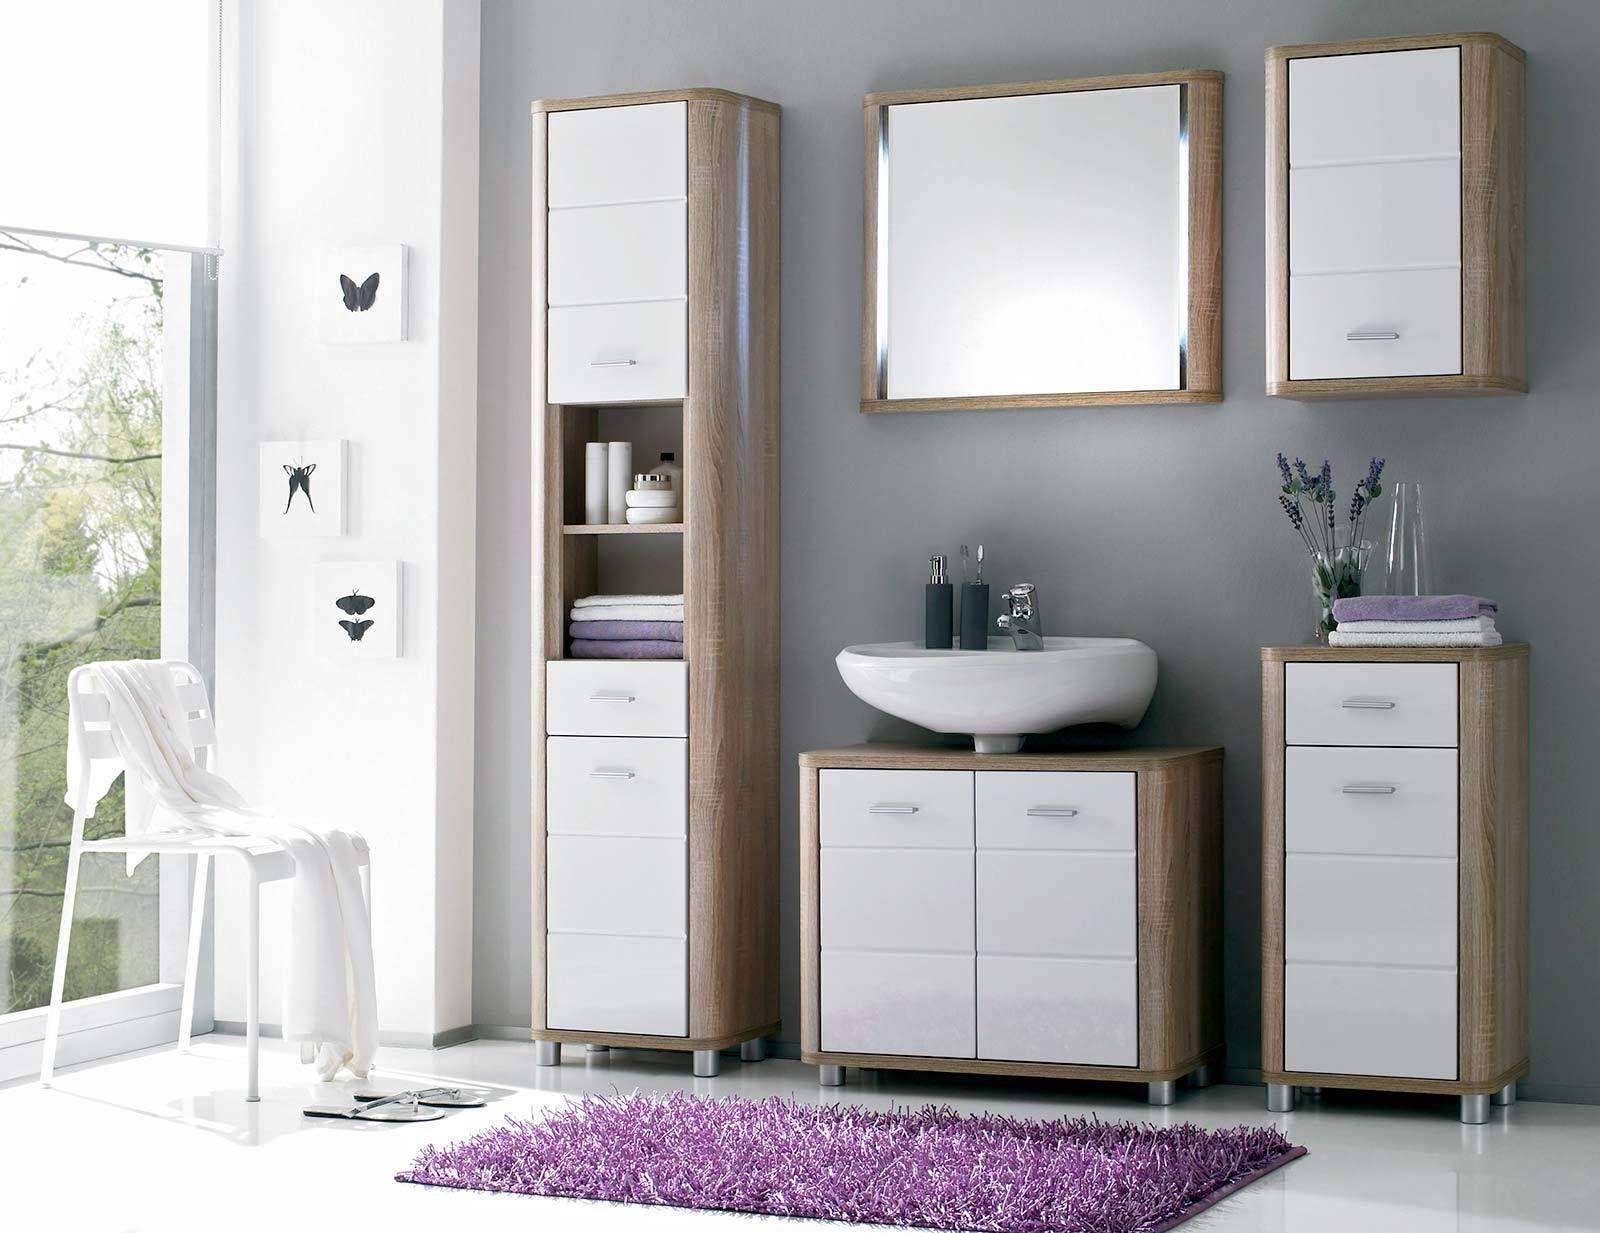 5 tlg badblock vital in eiche sonoma wei glanz. Black Bedroom Furniture Sets. Home Design Ideas